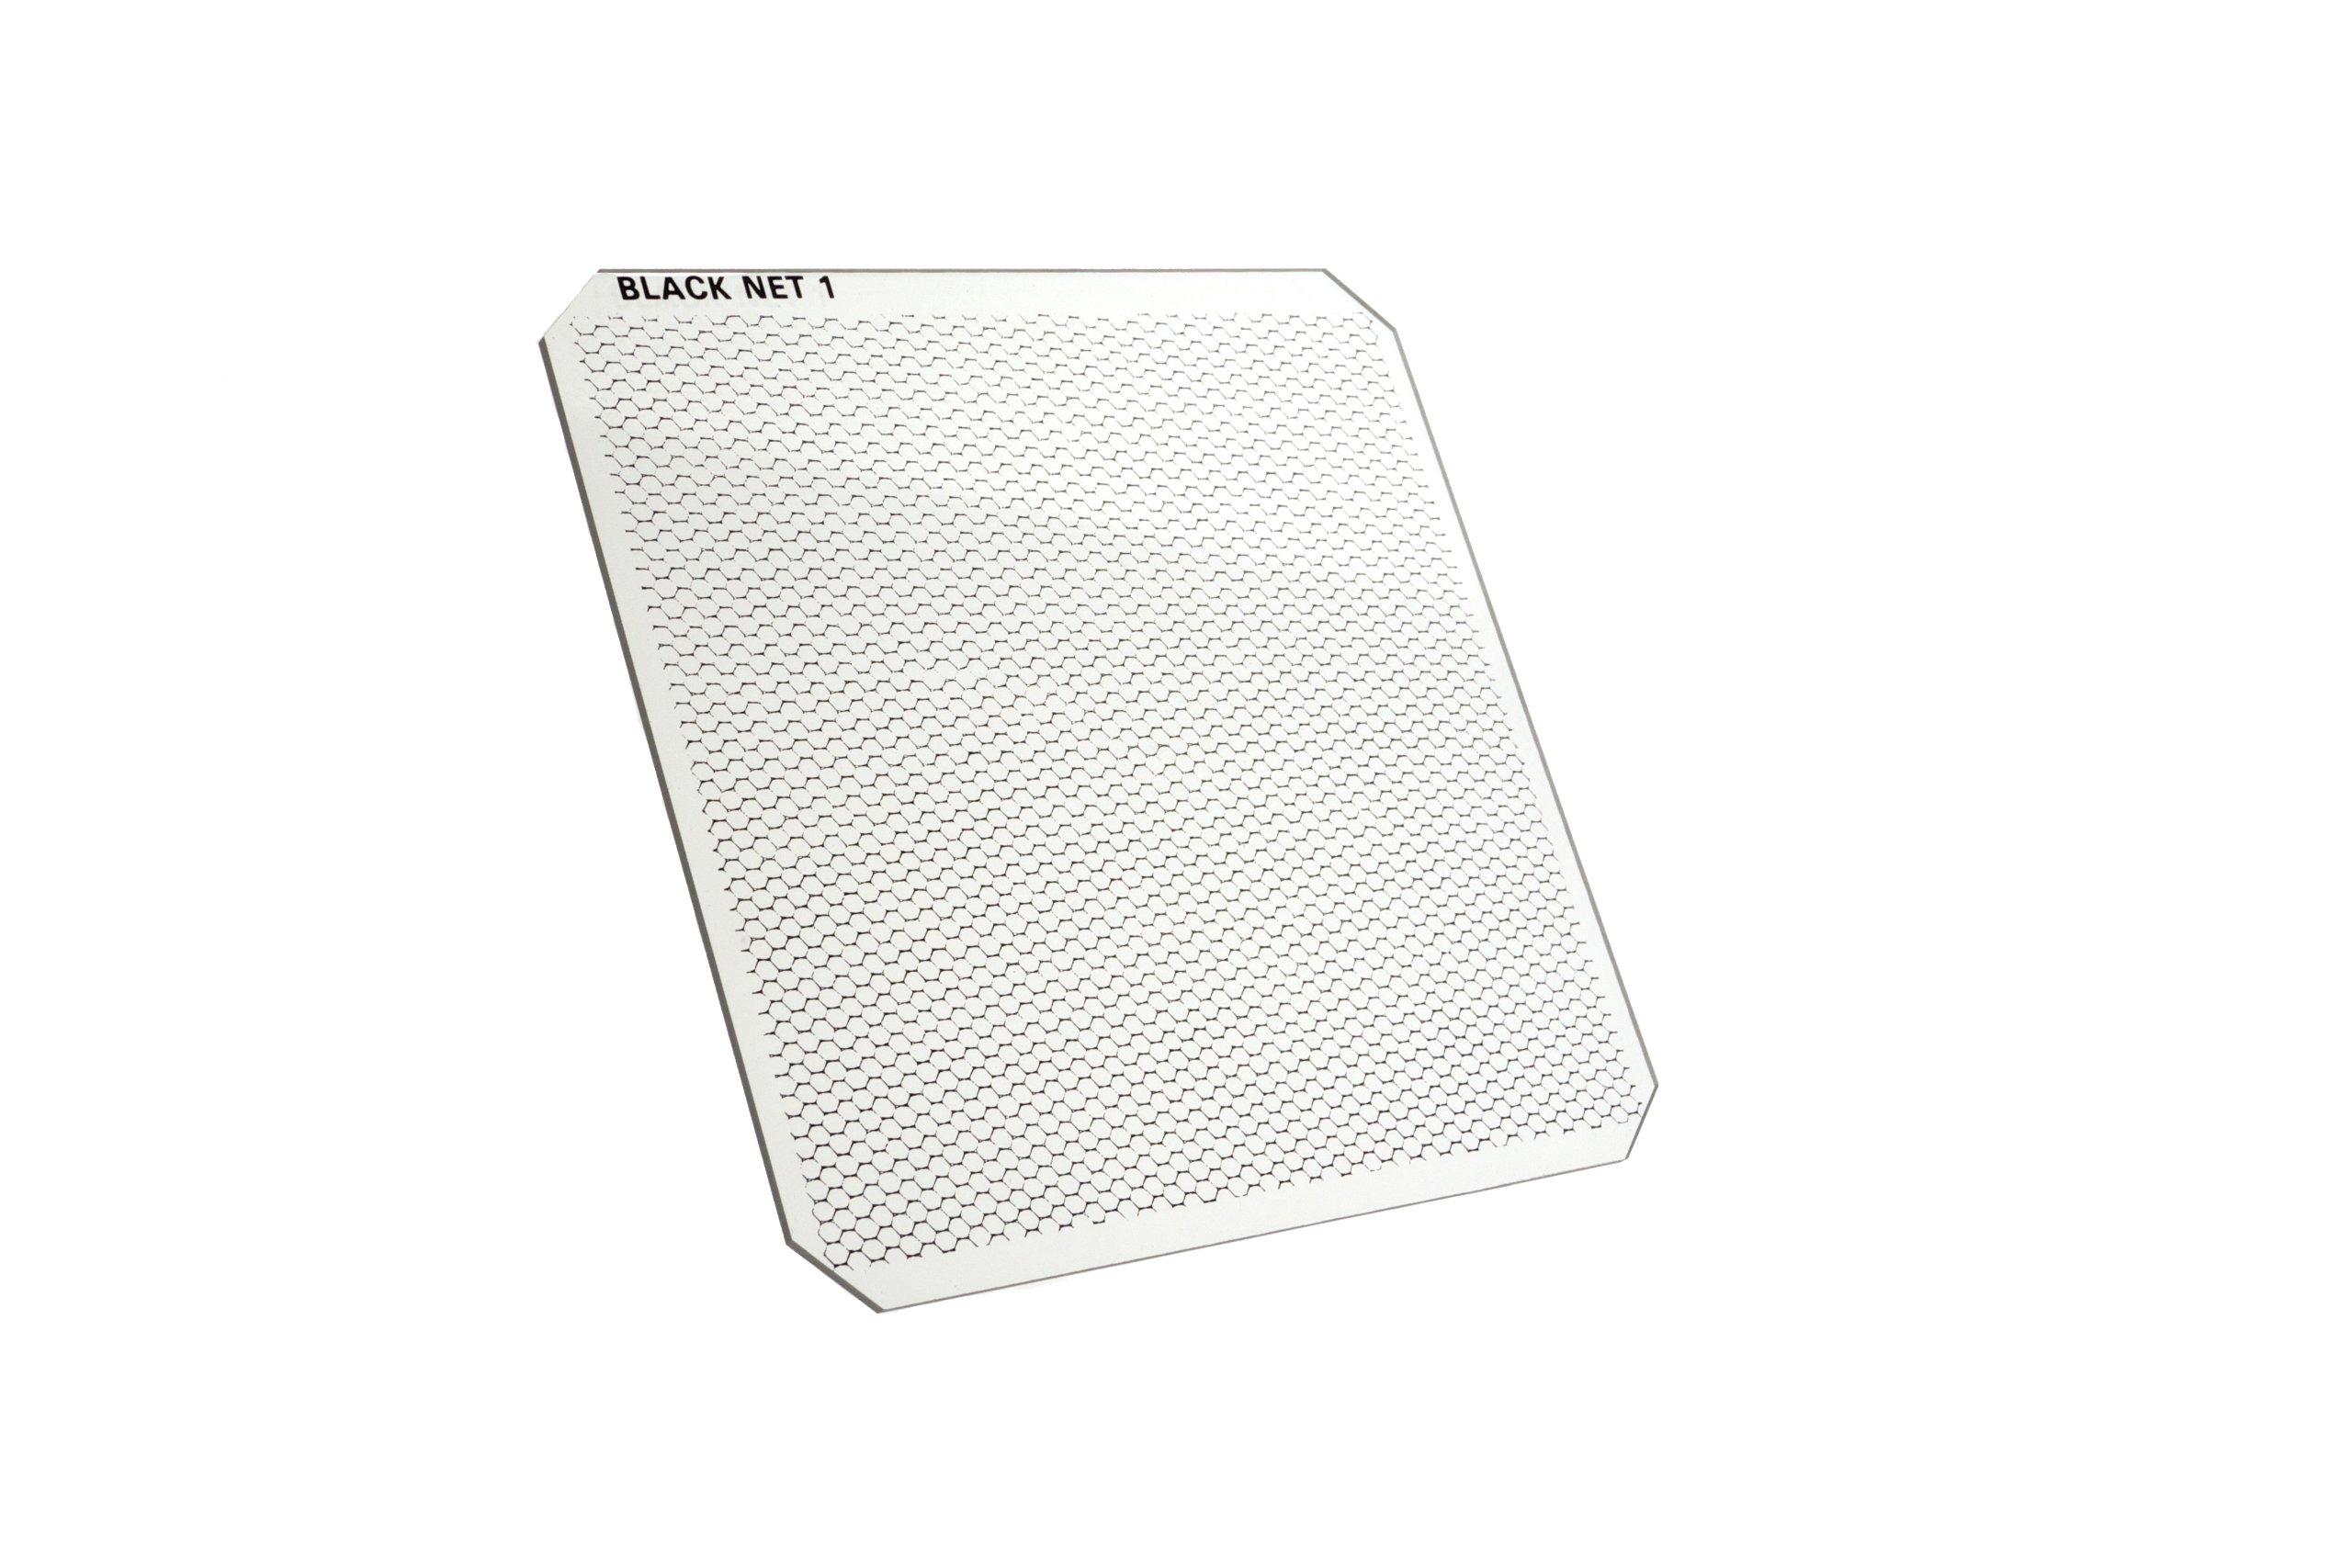 Formatt-Hitech 100x100mm (4x4'') Resin Black Net 1 by Formatt Hitech Limited